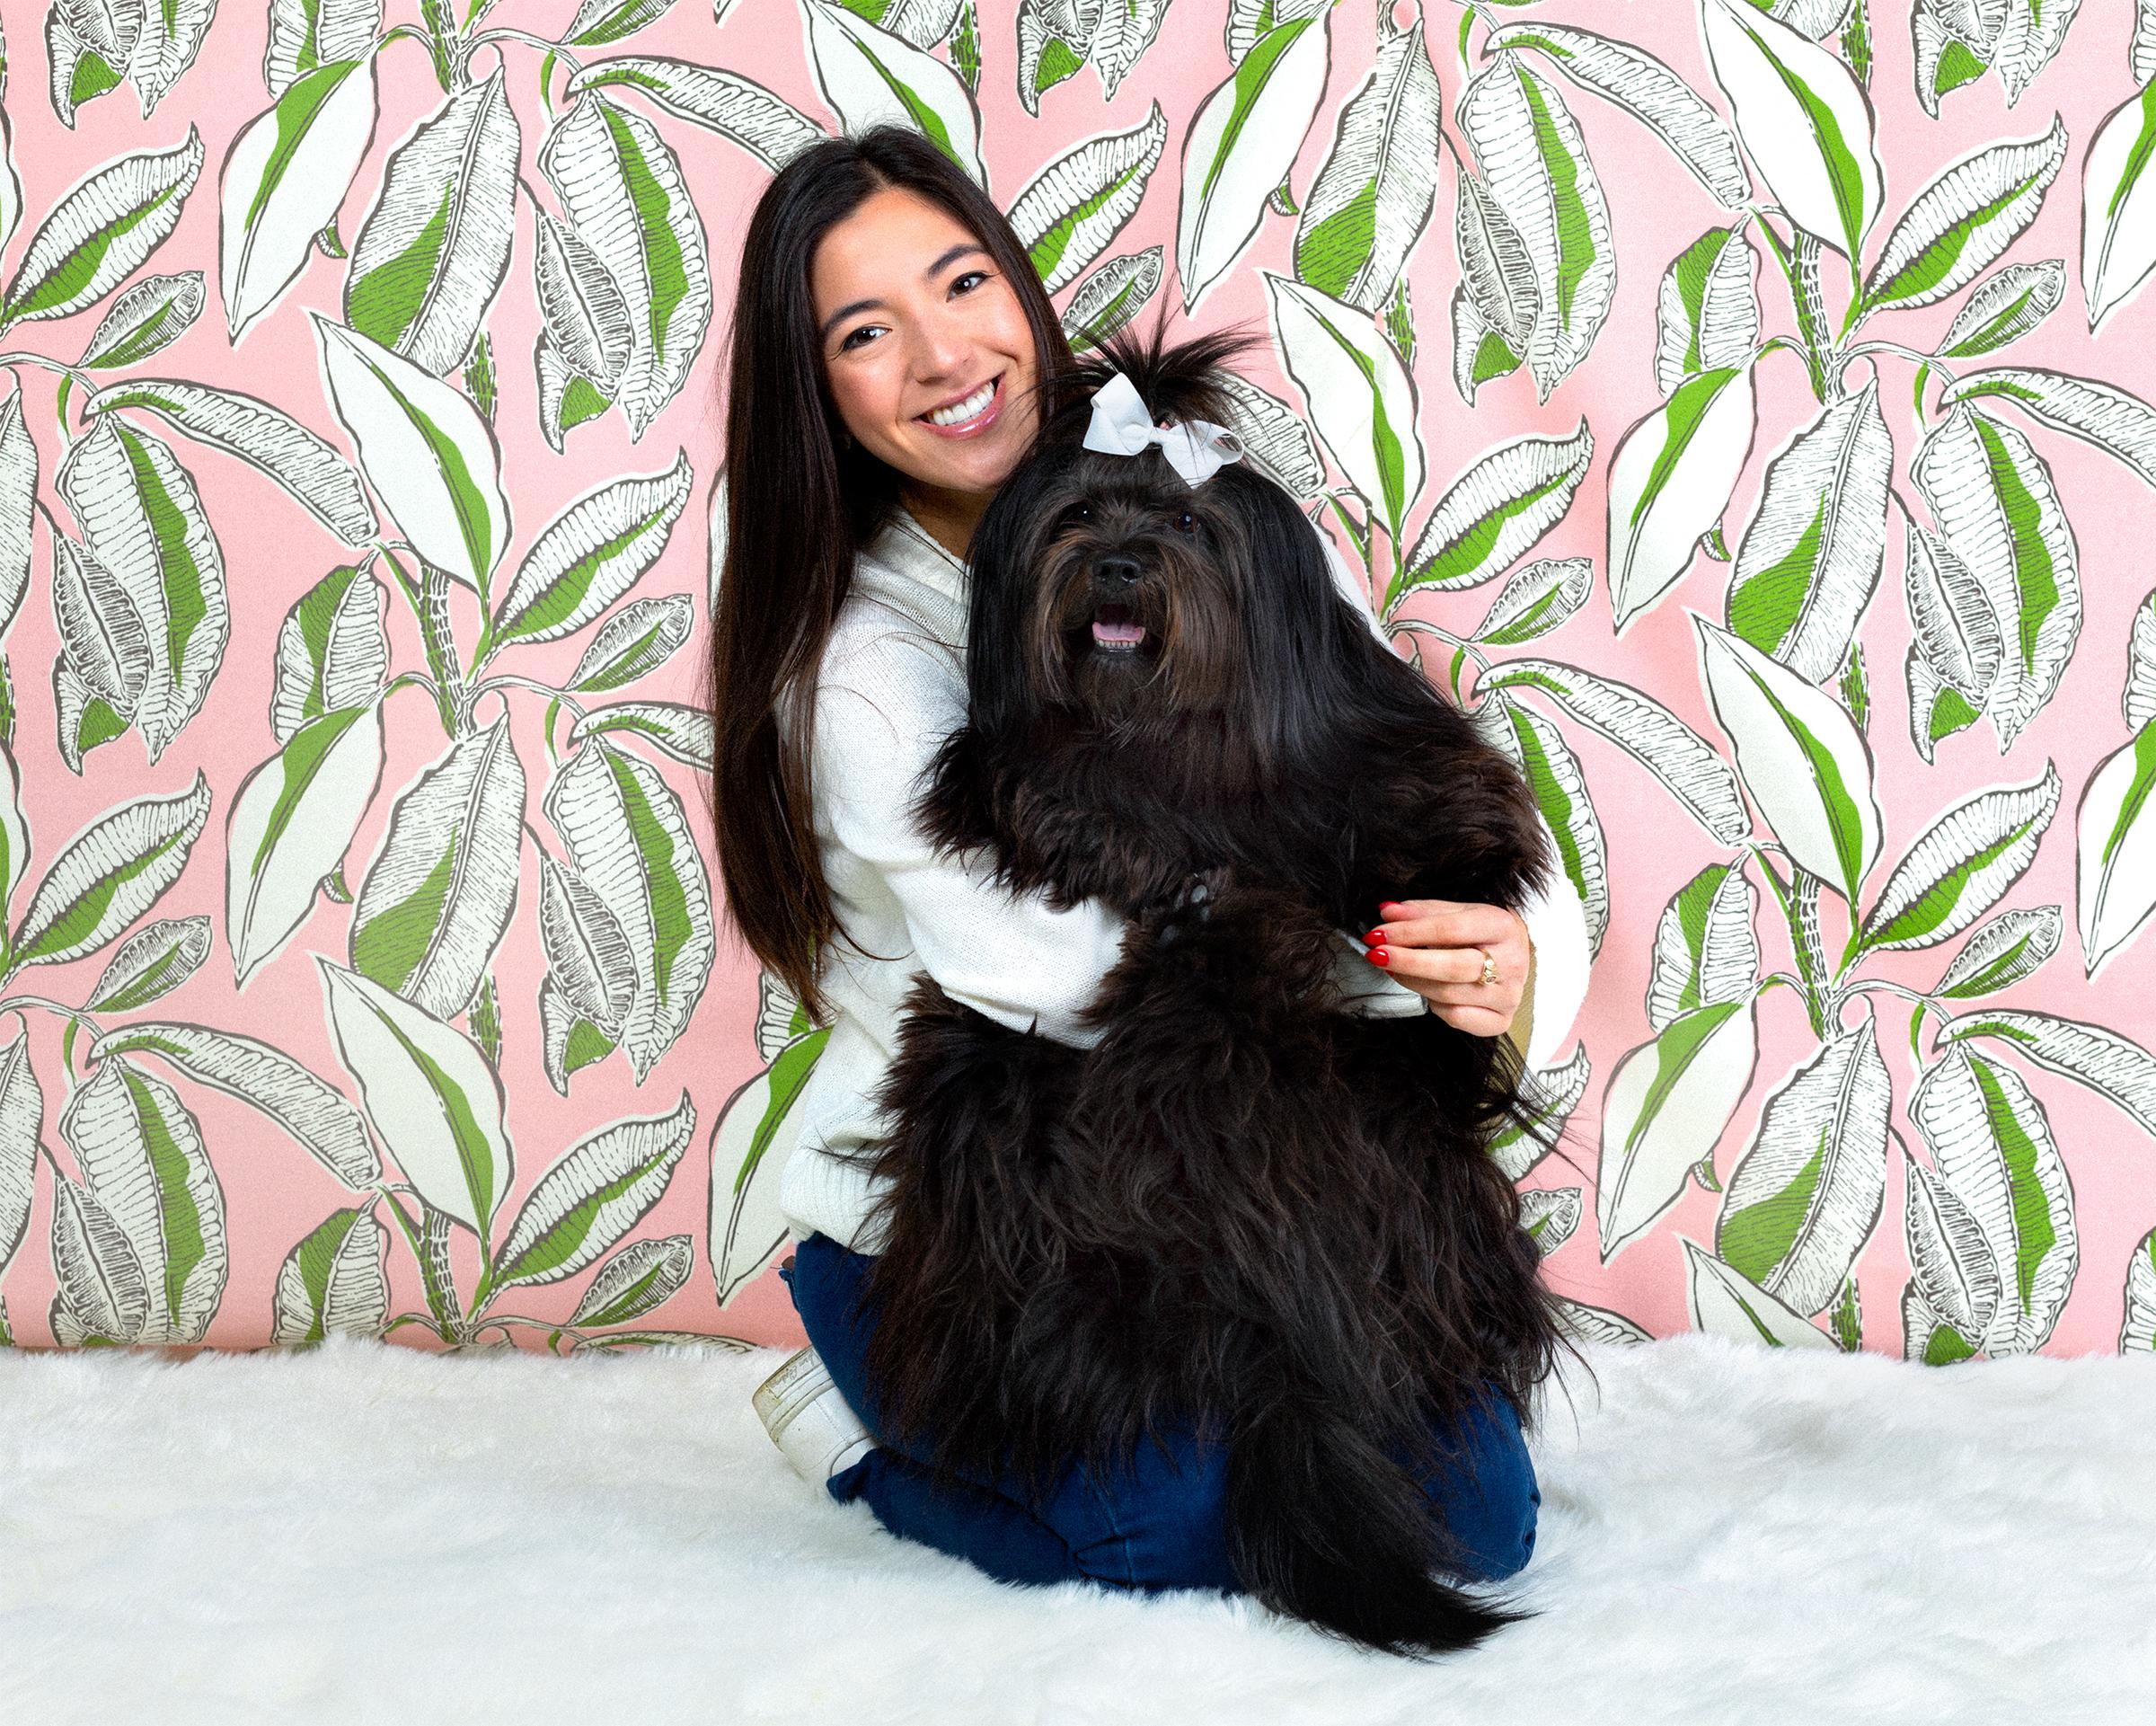 20190519_Pet Portrait_Danielle Spires-9264.jpg